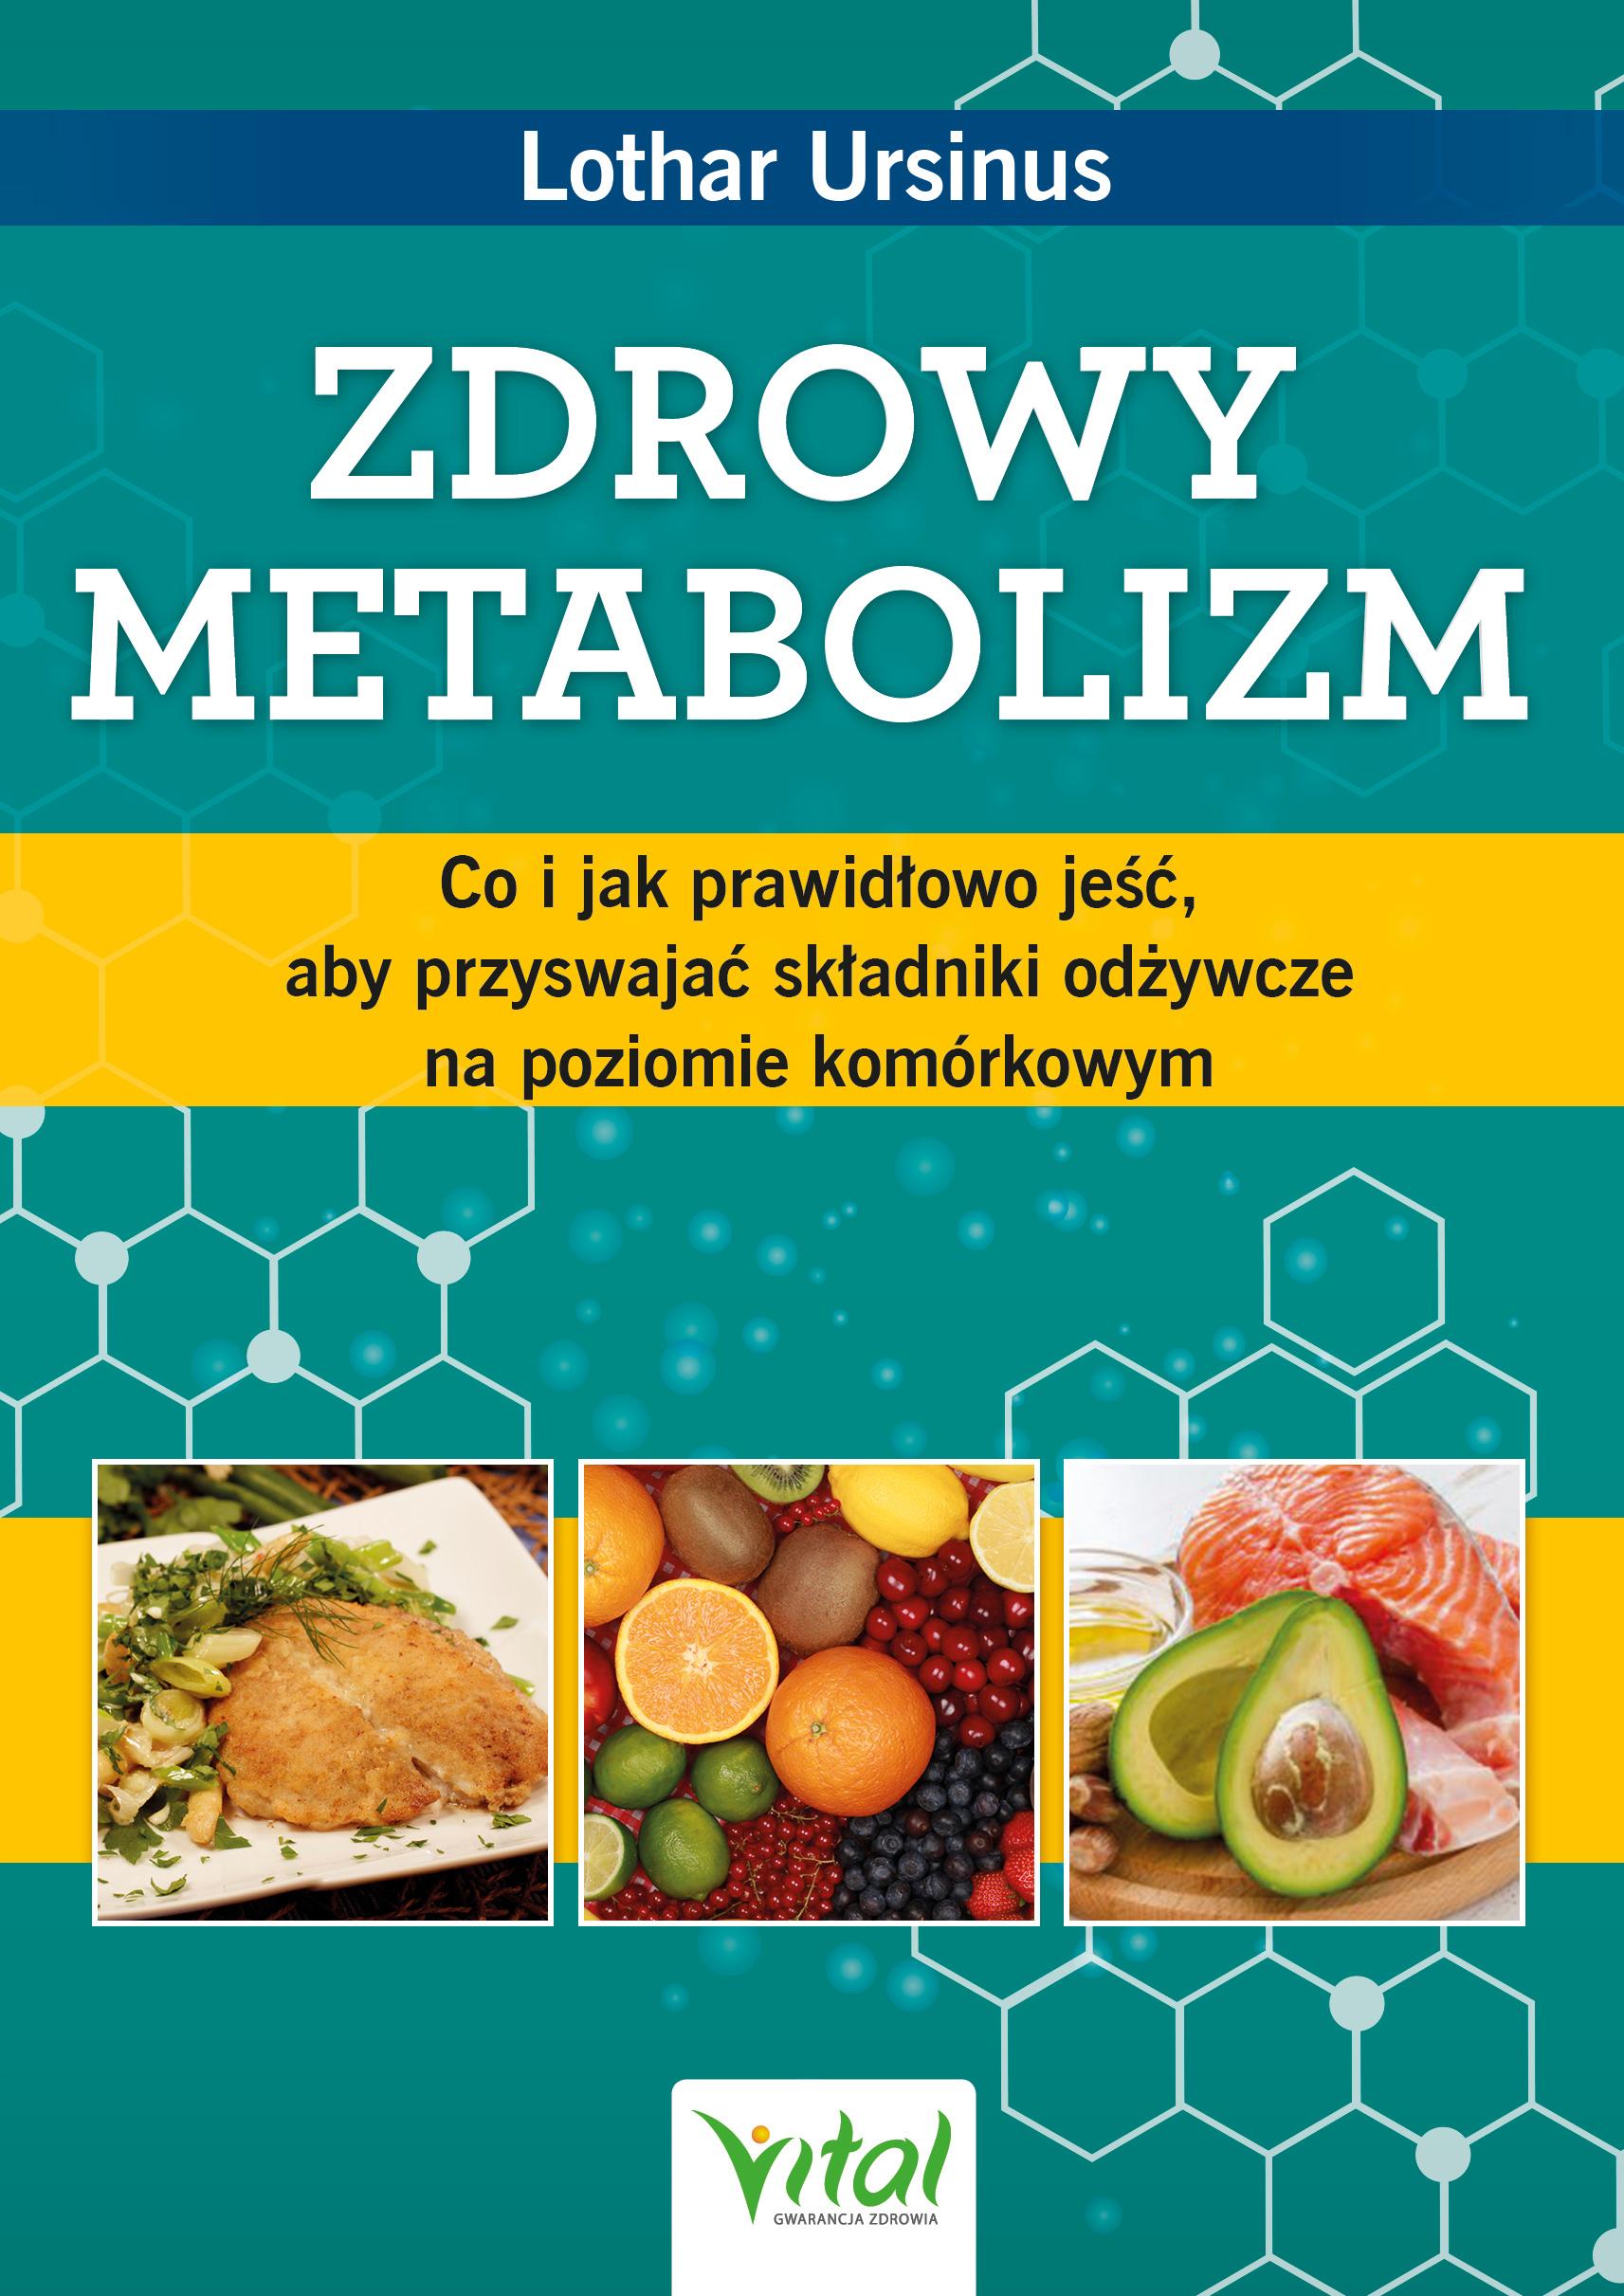 Zdrowy metabolizm Lothar Ursinus